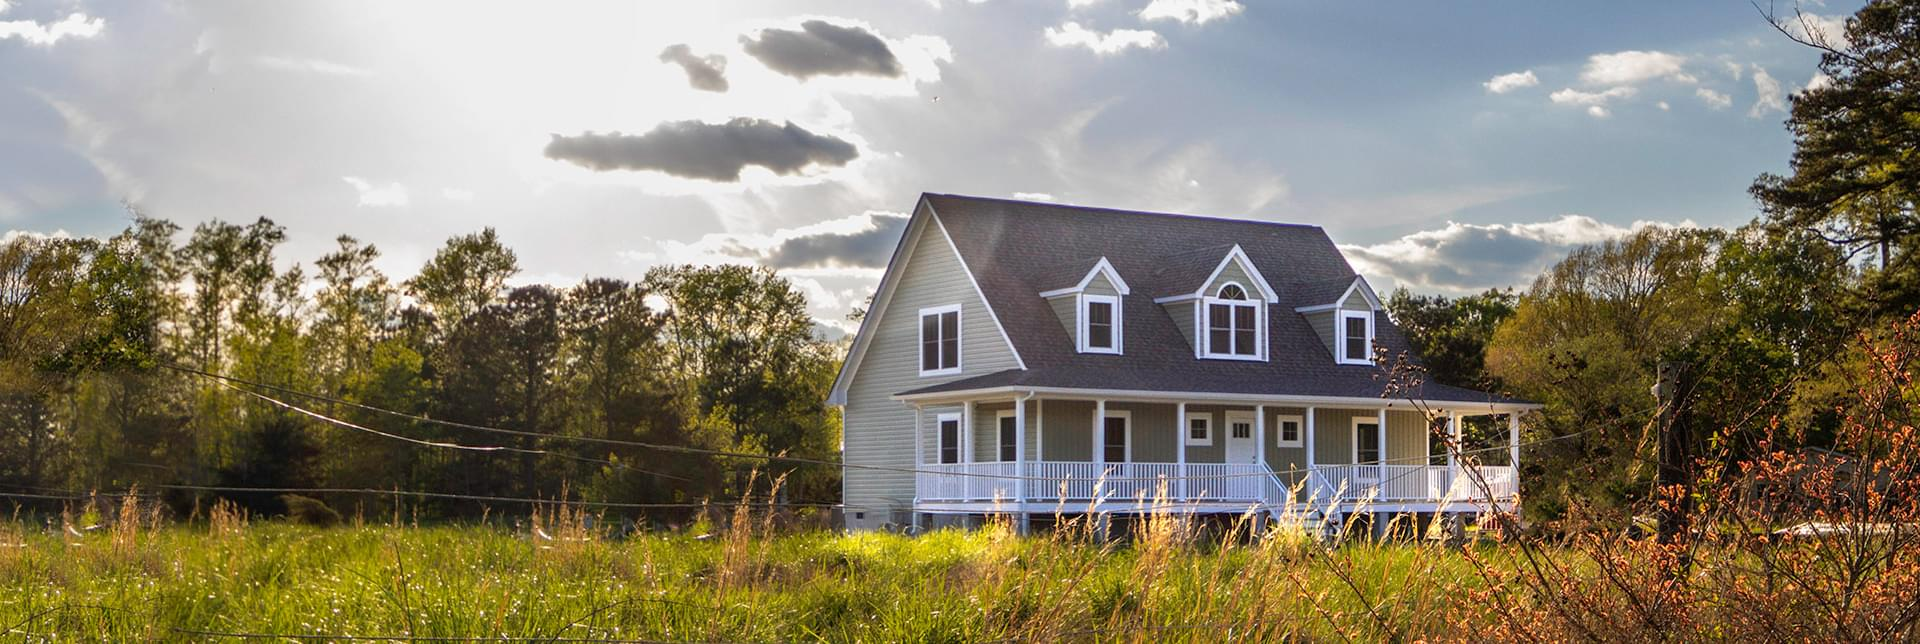 New Homes in Harrisonburg VA